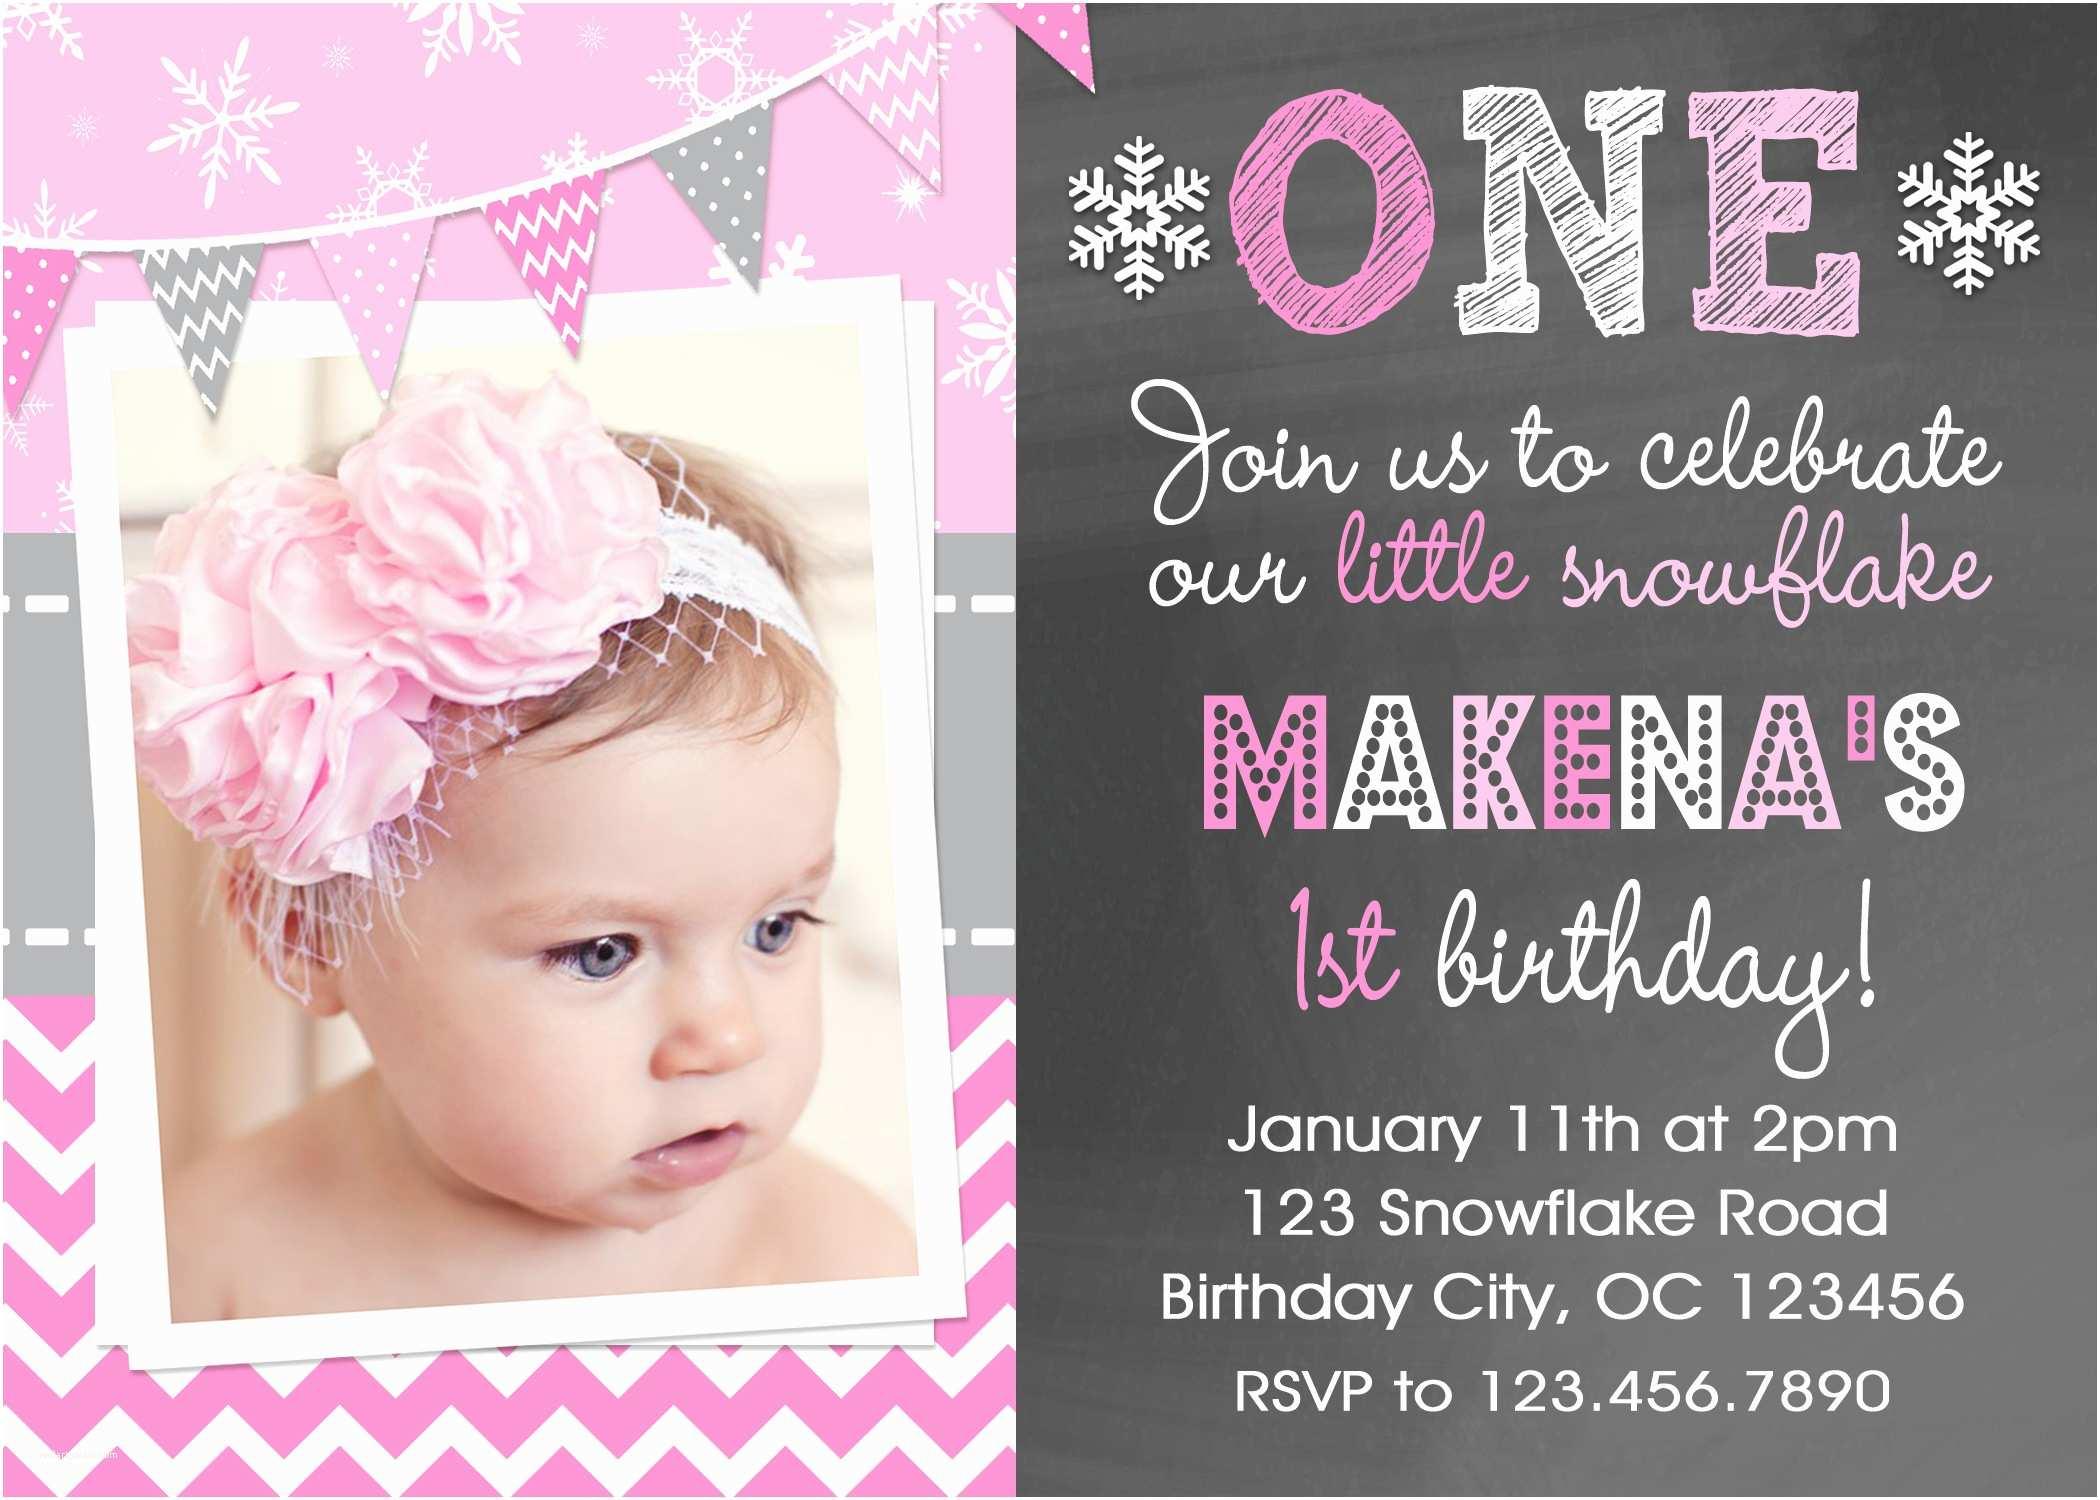 Girl Birthday Party Invitations Snowflake Printable Birthday Invitations Girls